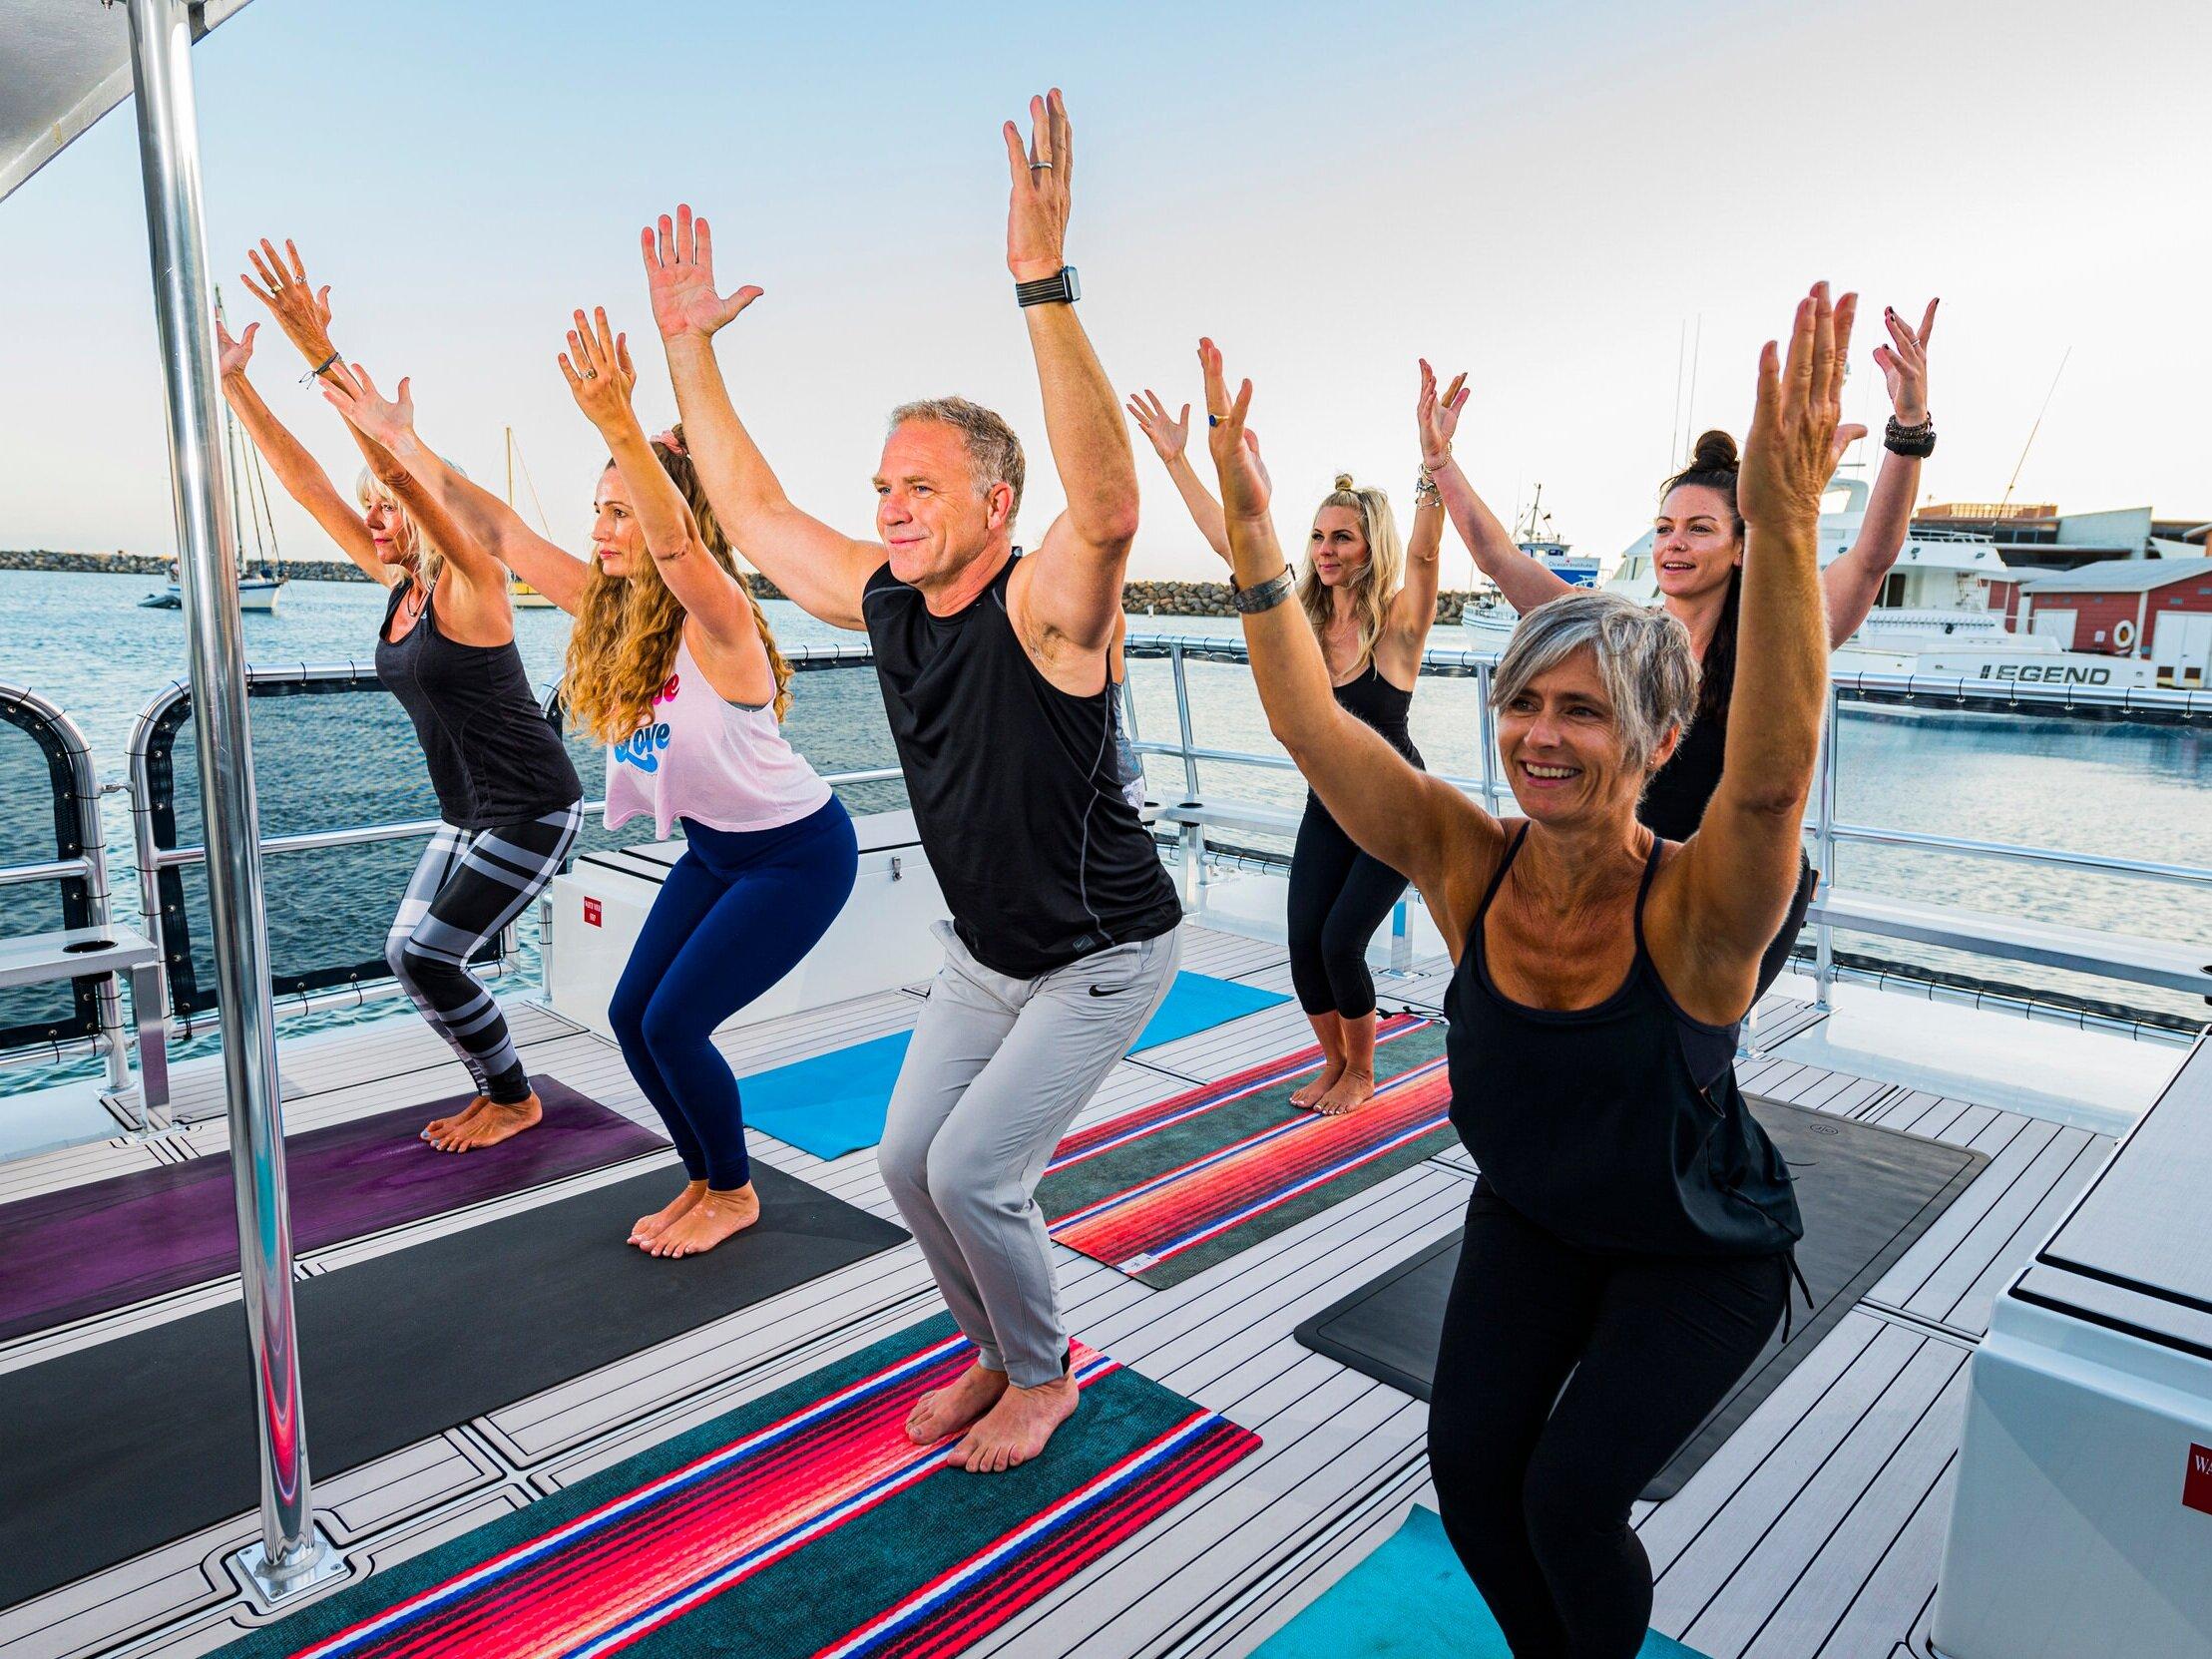 60 Minute Yoga Class at Sea